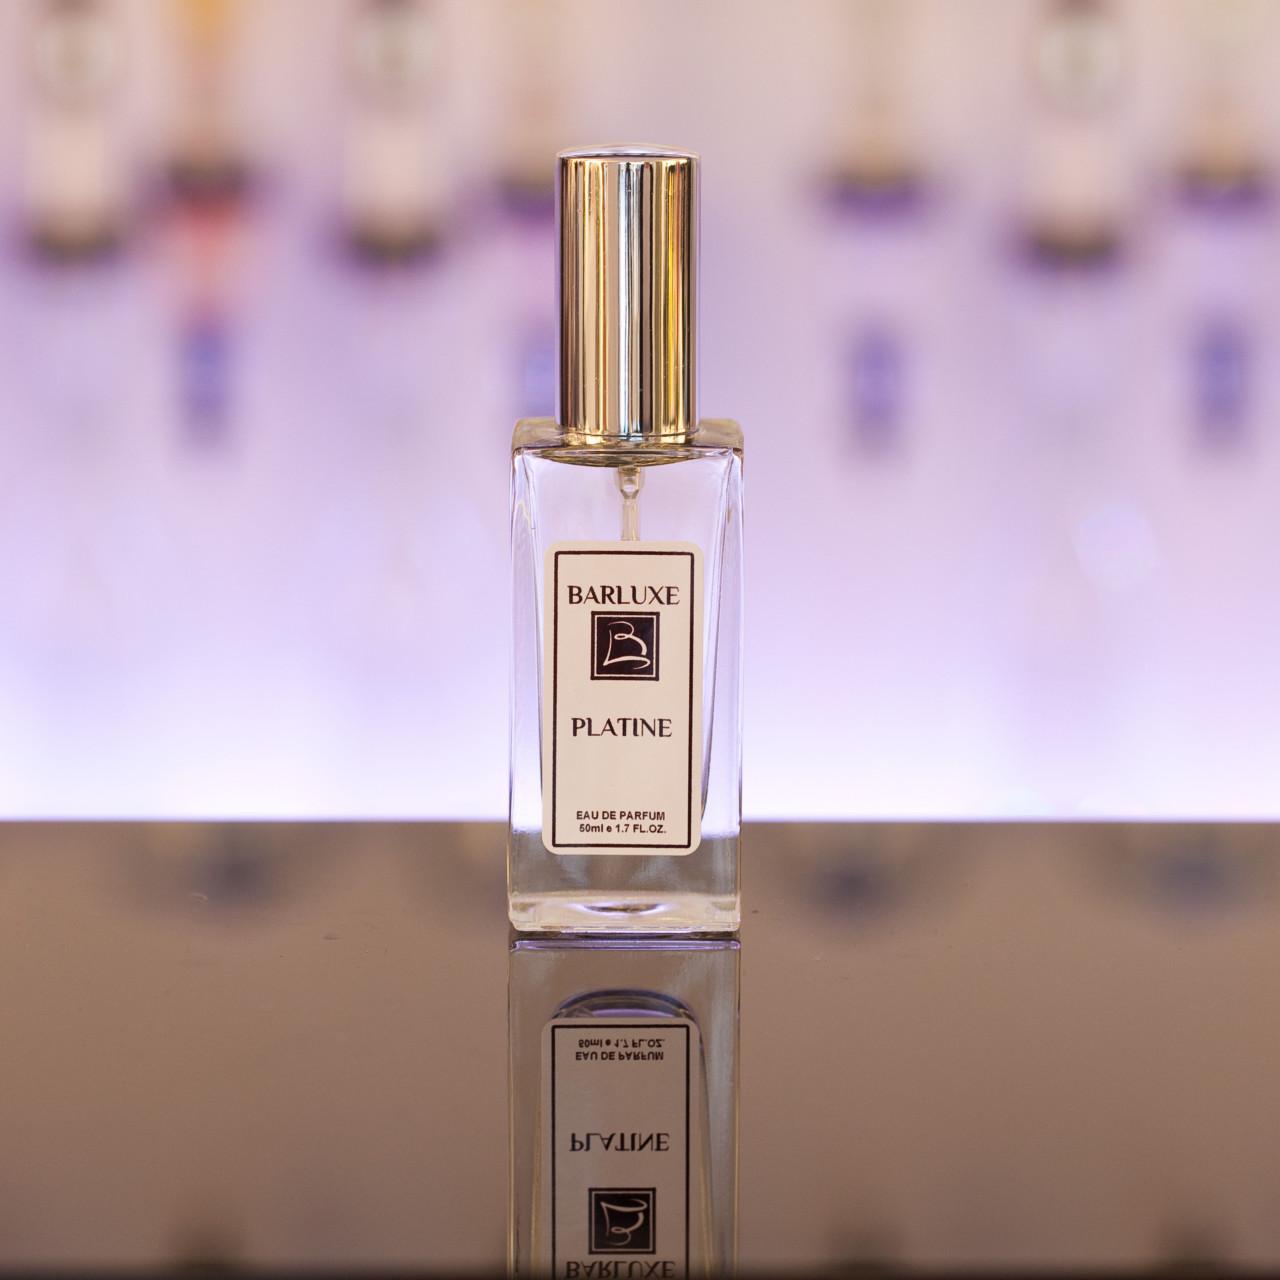 herren-parfum-dupe-double-duft-duftzwilling-platine